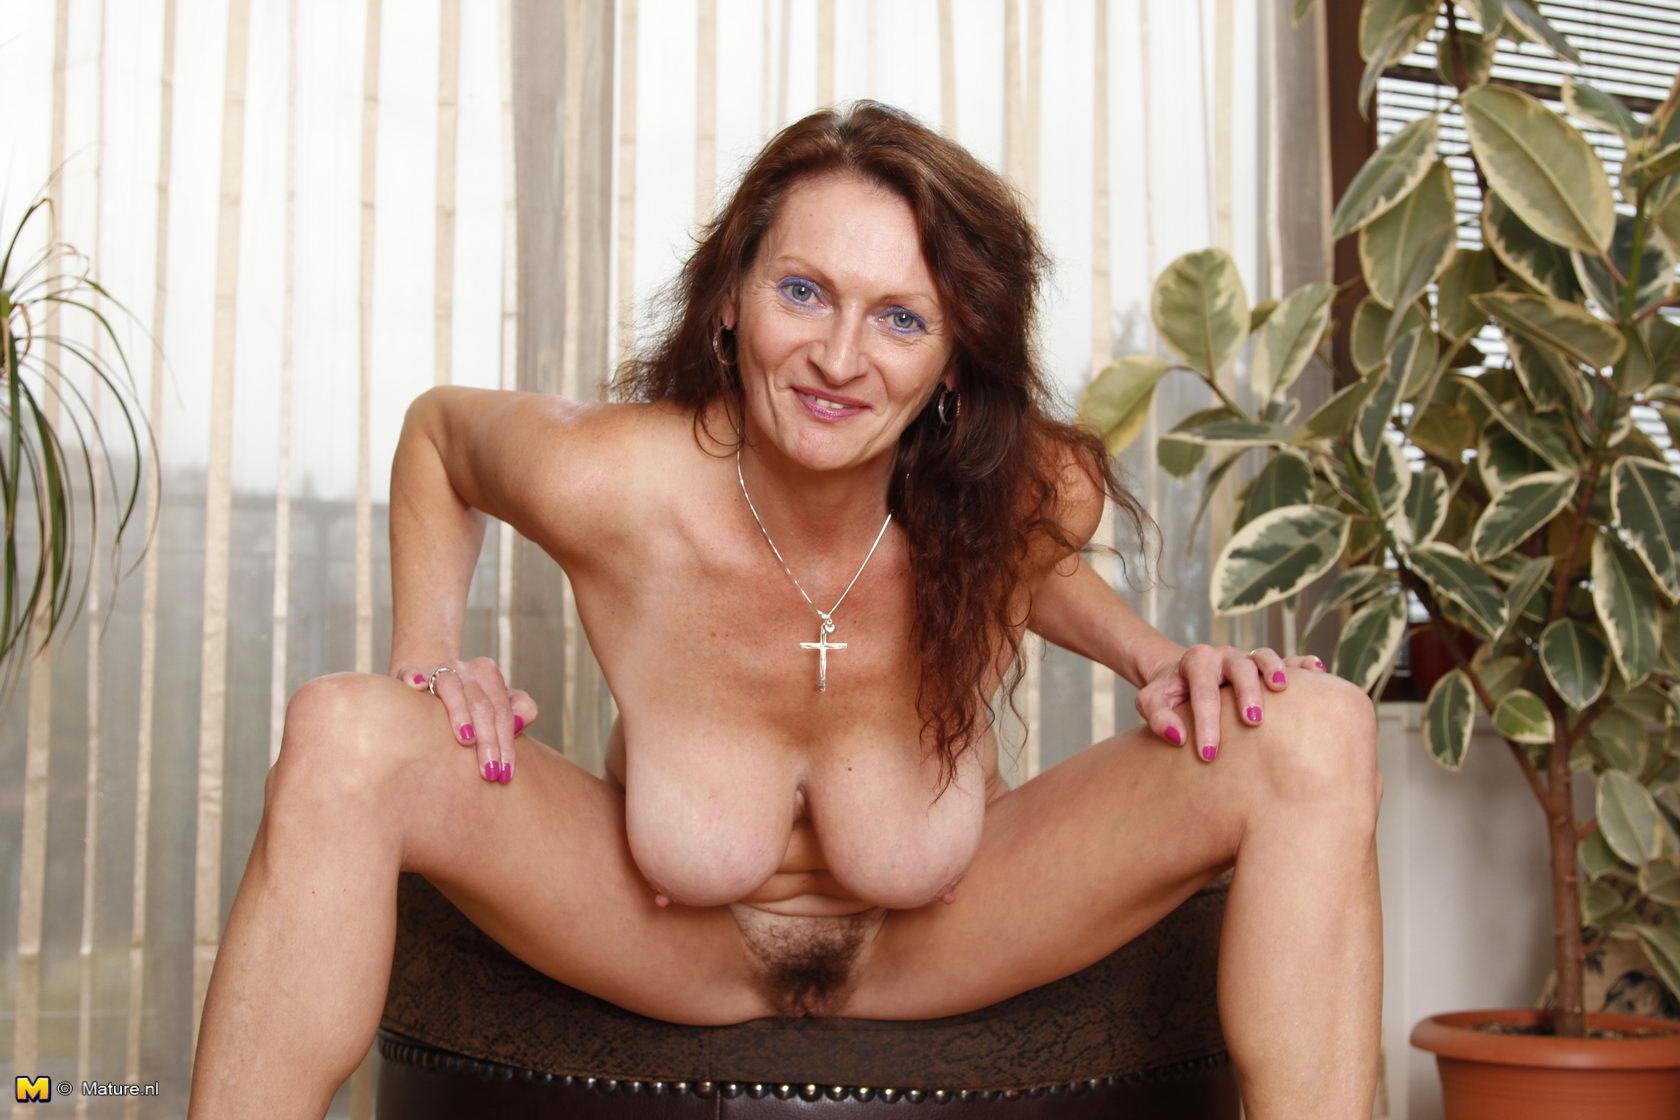 Porn very mature, zebra fuck woman image